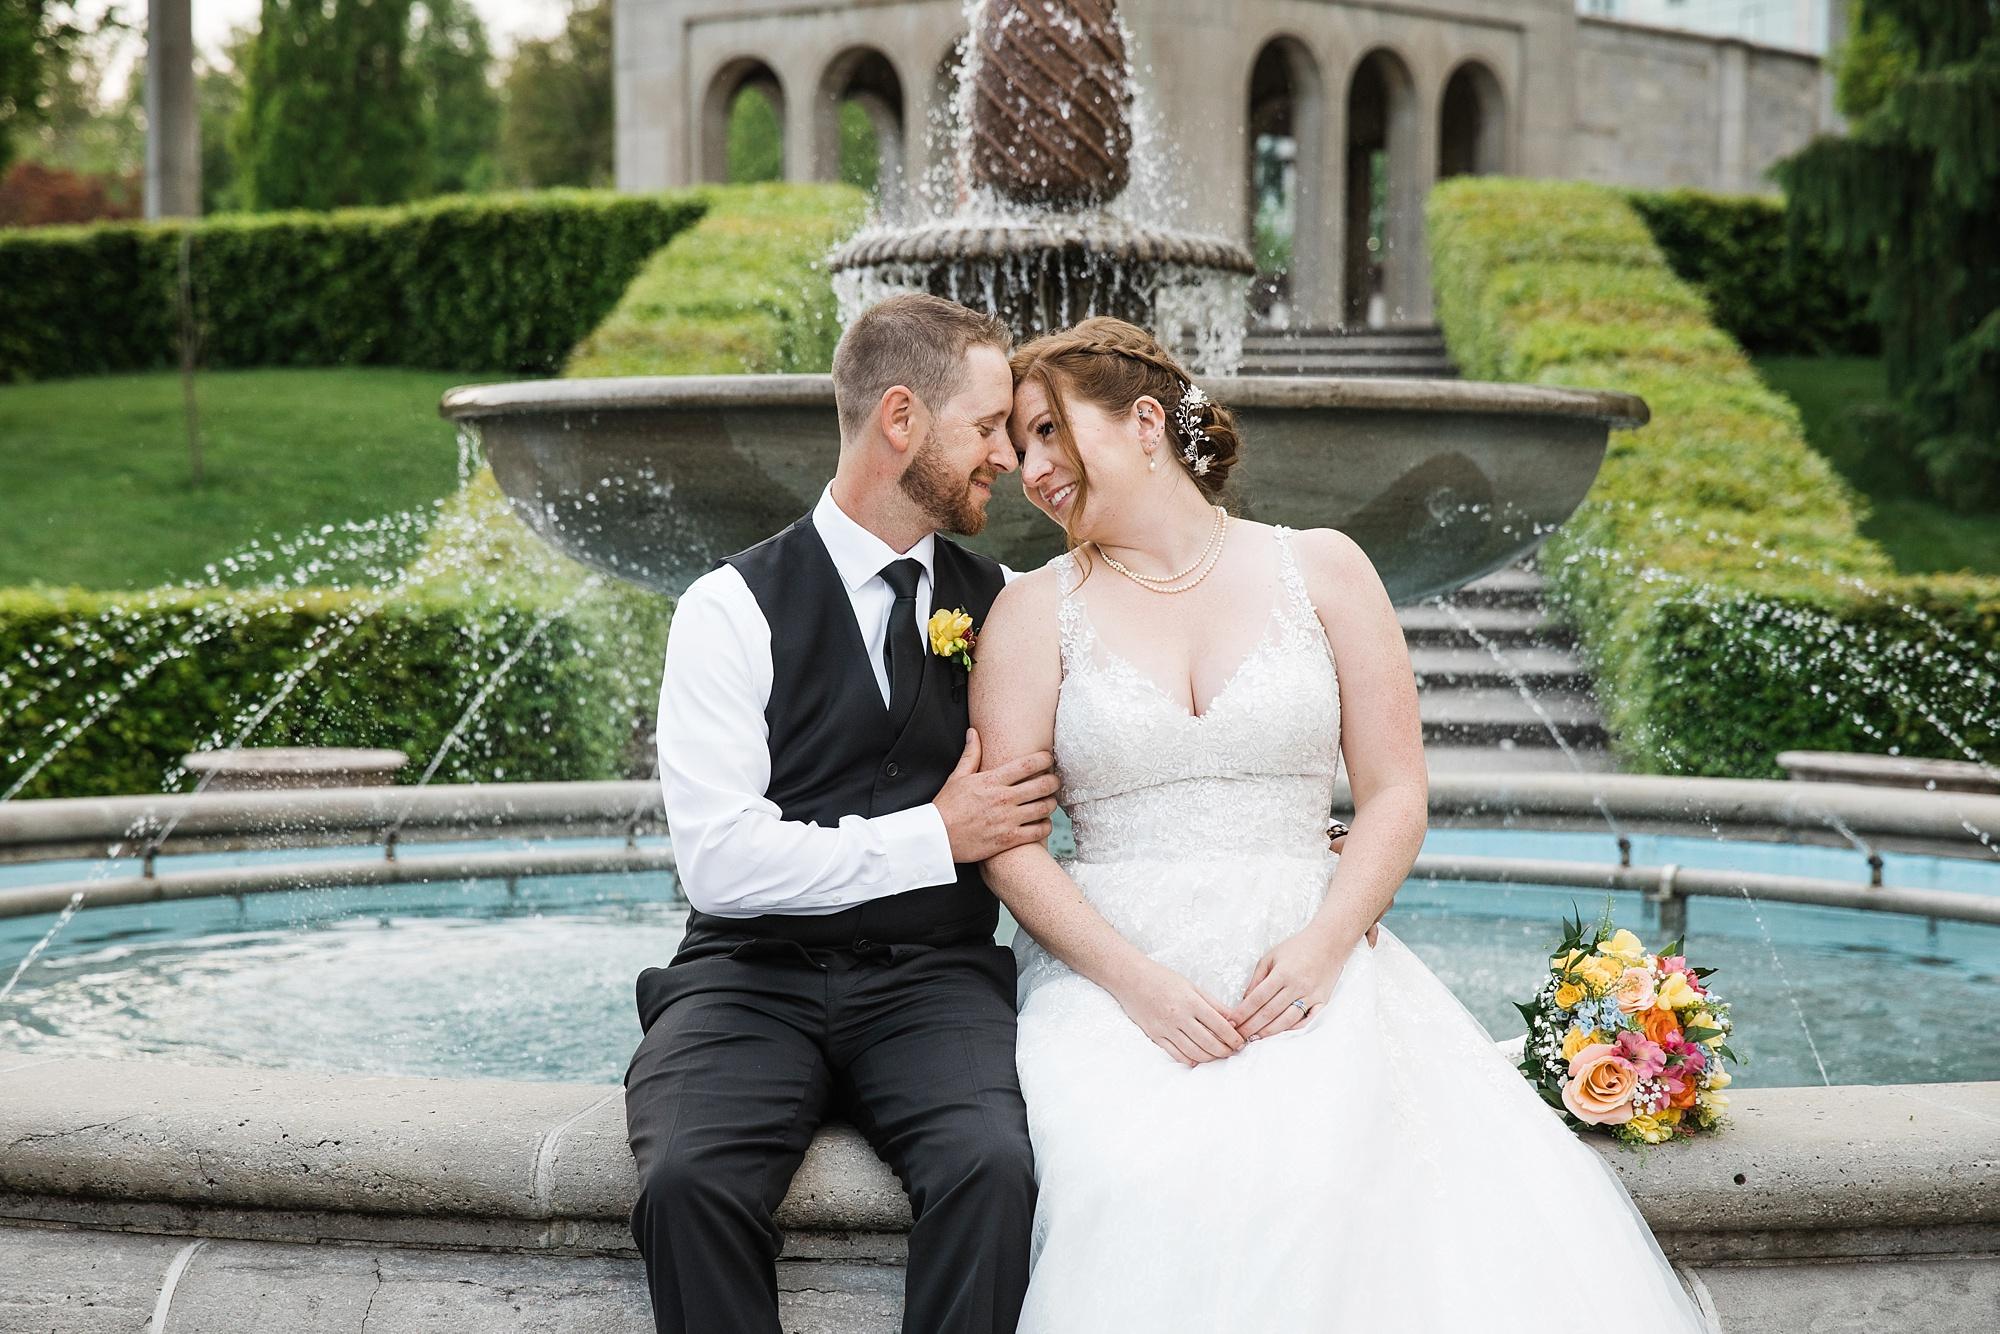 niagarafalls-weddingphotography_0050.jpg